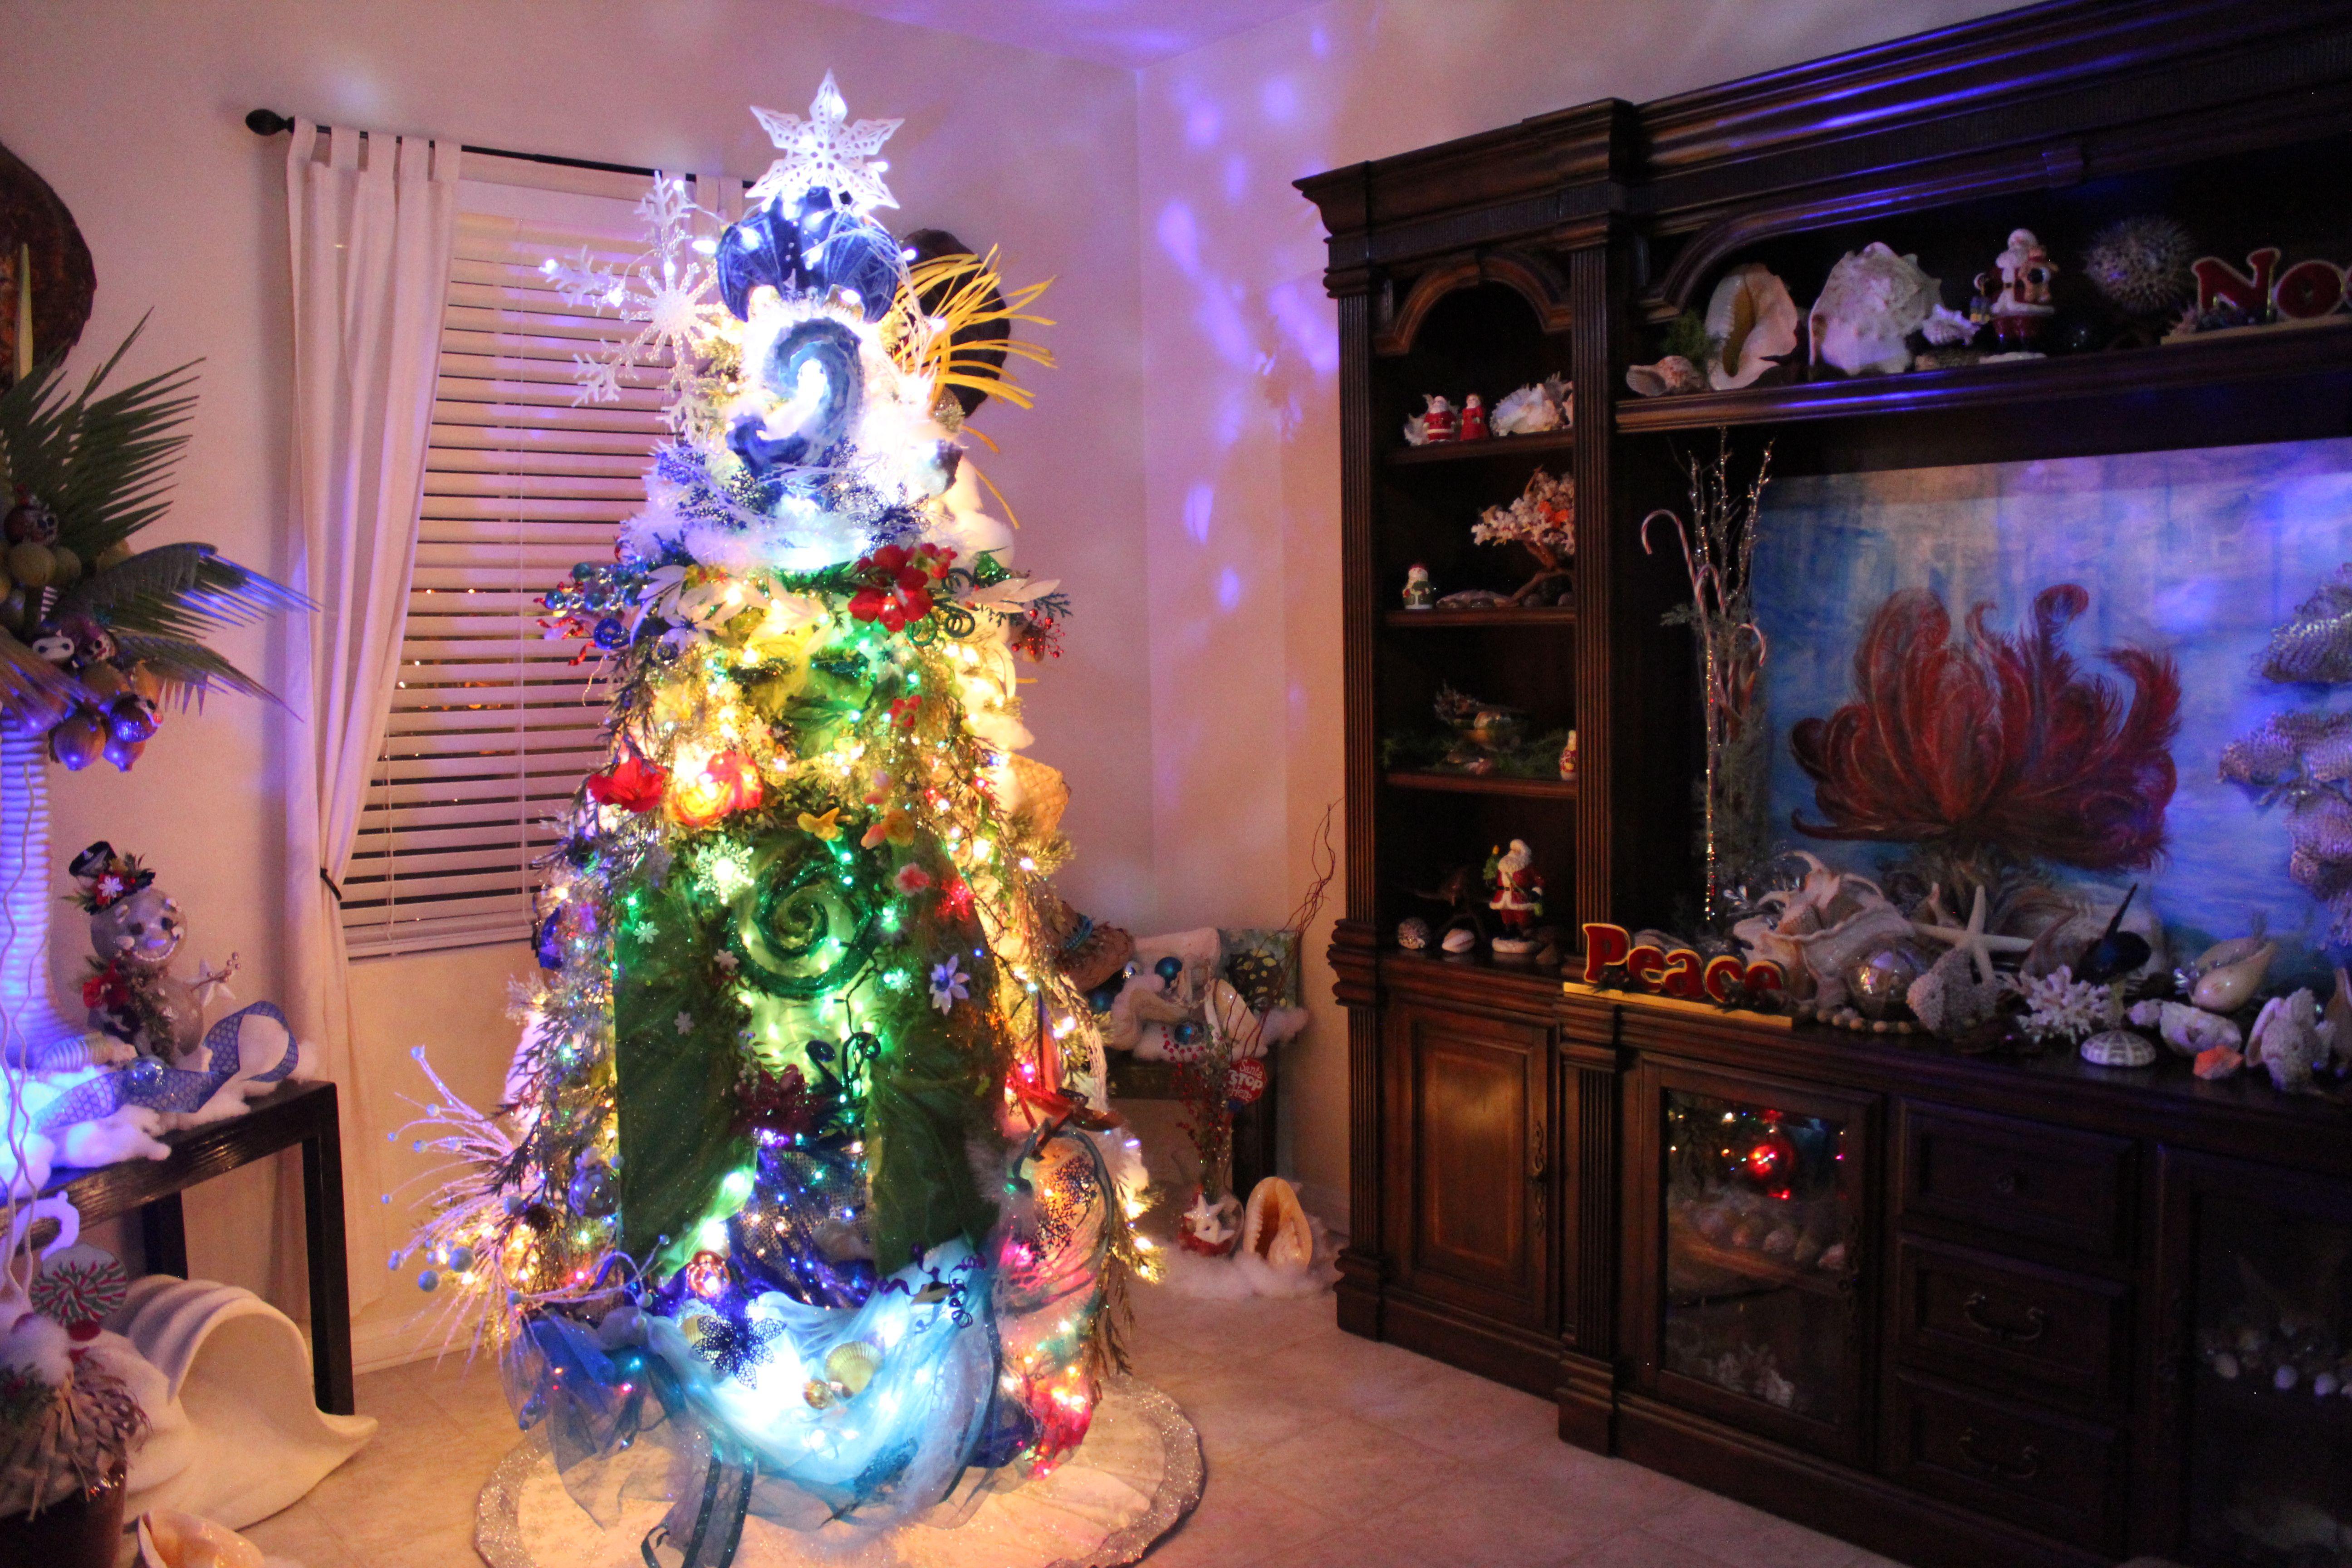 Diy We Know The Way Te Fiti Design By Api 2017 Rotating Tree 1 Side Te Ka 1 Side Te Fiti Te Fiti Christmas Tree Christmas Tree Tree Christmas